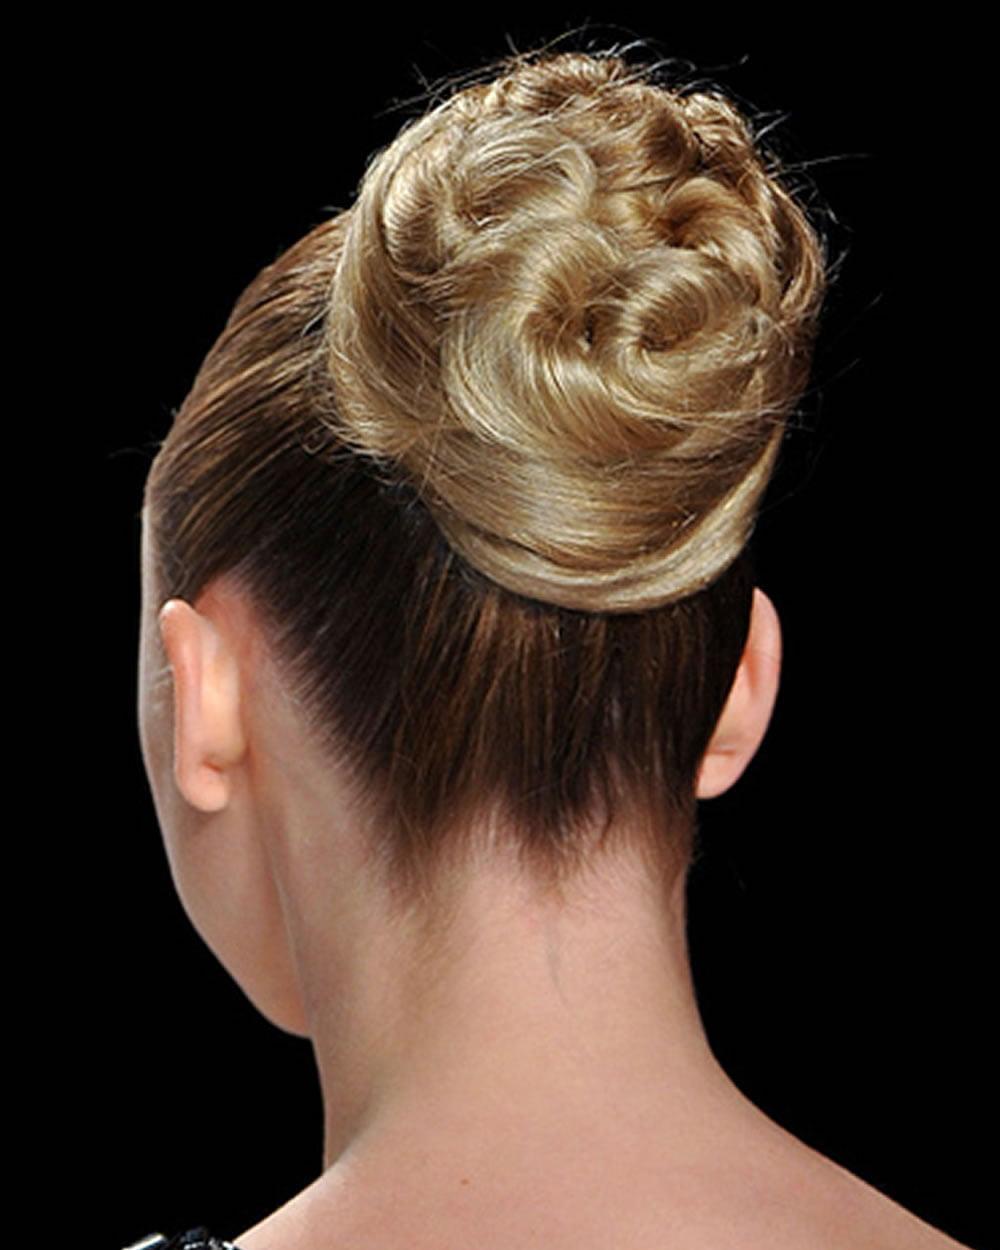 Bun Hair 2018 - Trend Bun Hairstyles in 2017